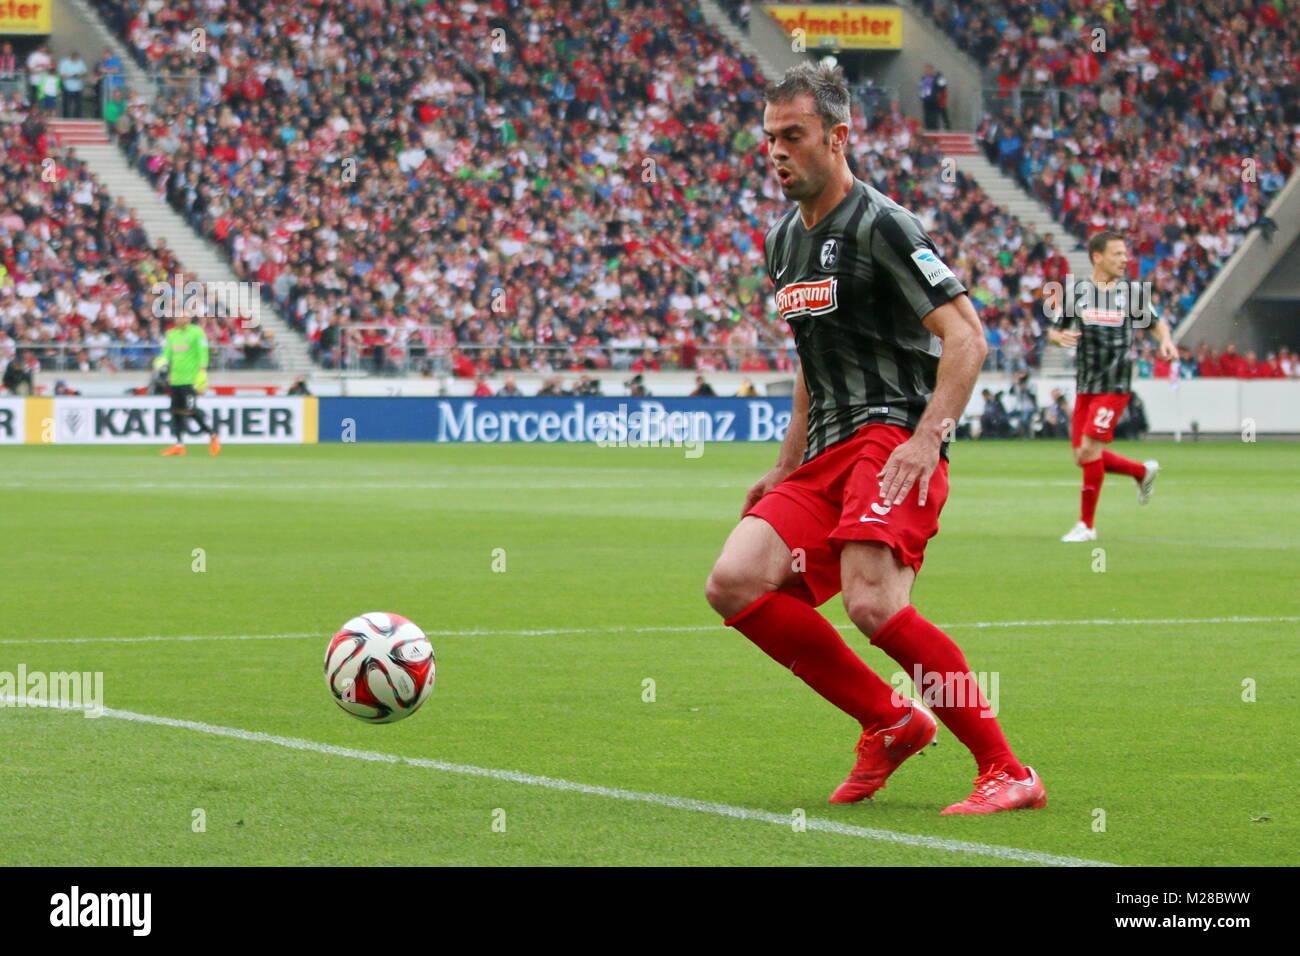 Marc Torrejon (Freiburg) am Ball - Fußball-Bundesliga 14/15: 30. Spieltag, SC Freiburg vs VfB Stuttgart - Stock Image